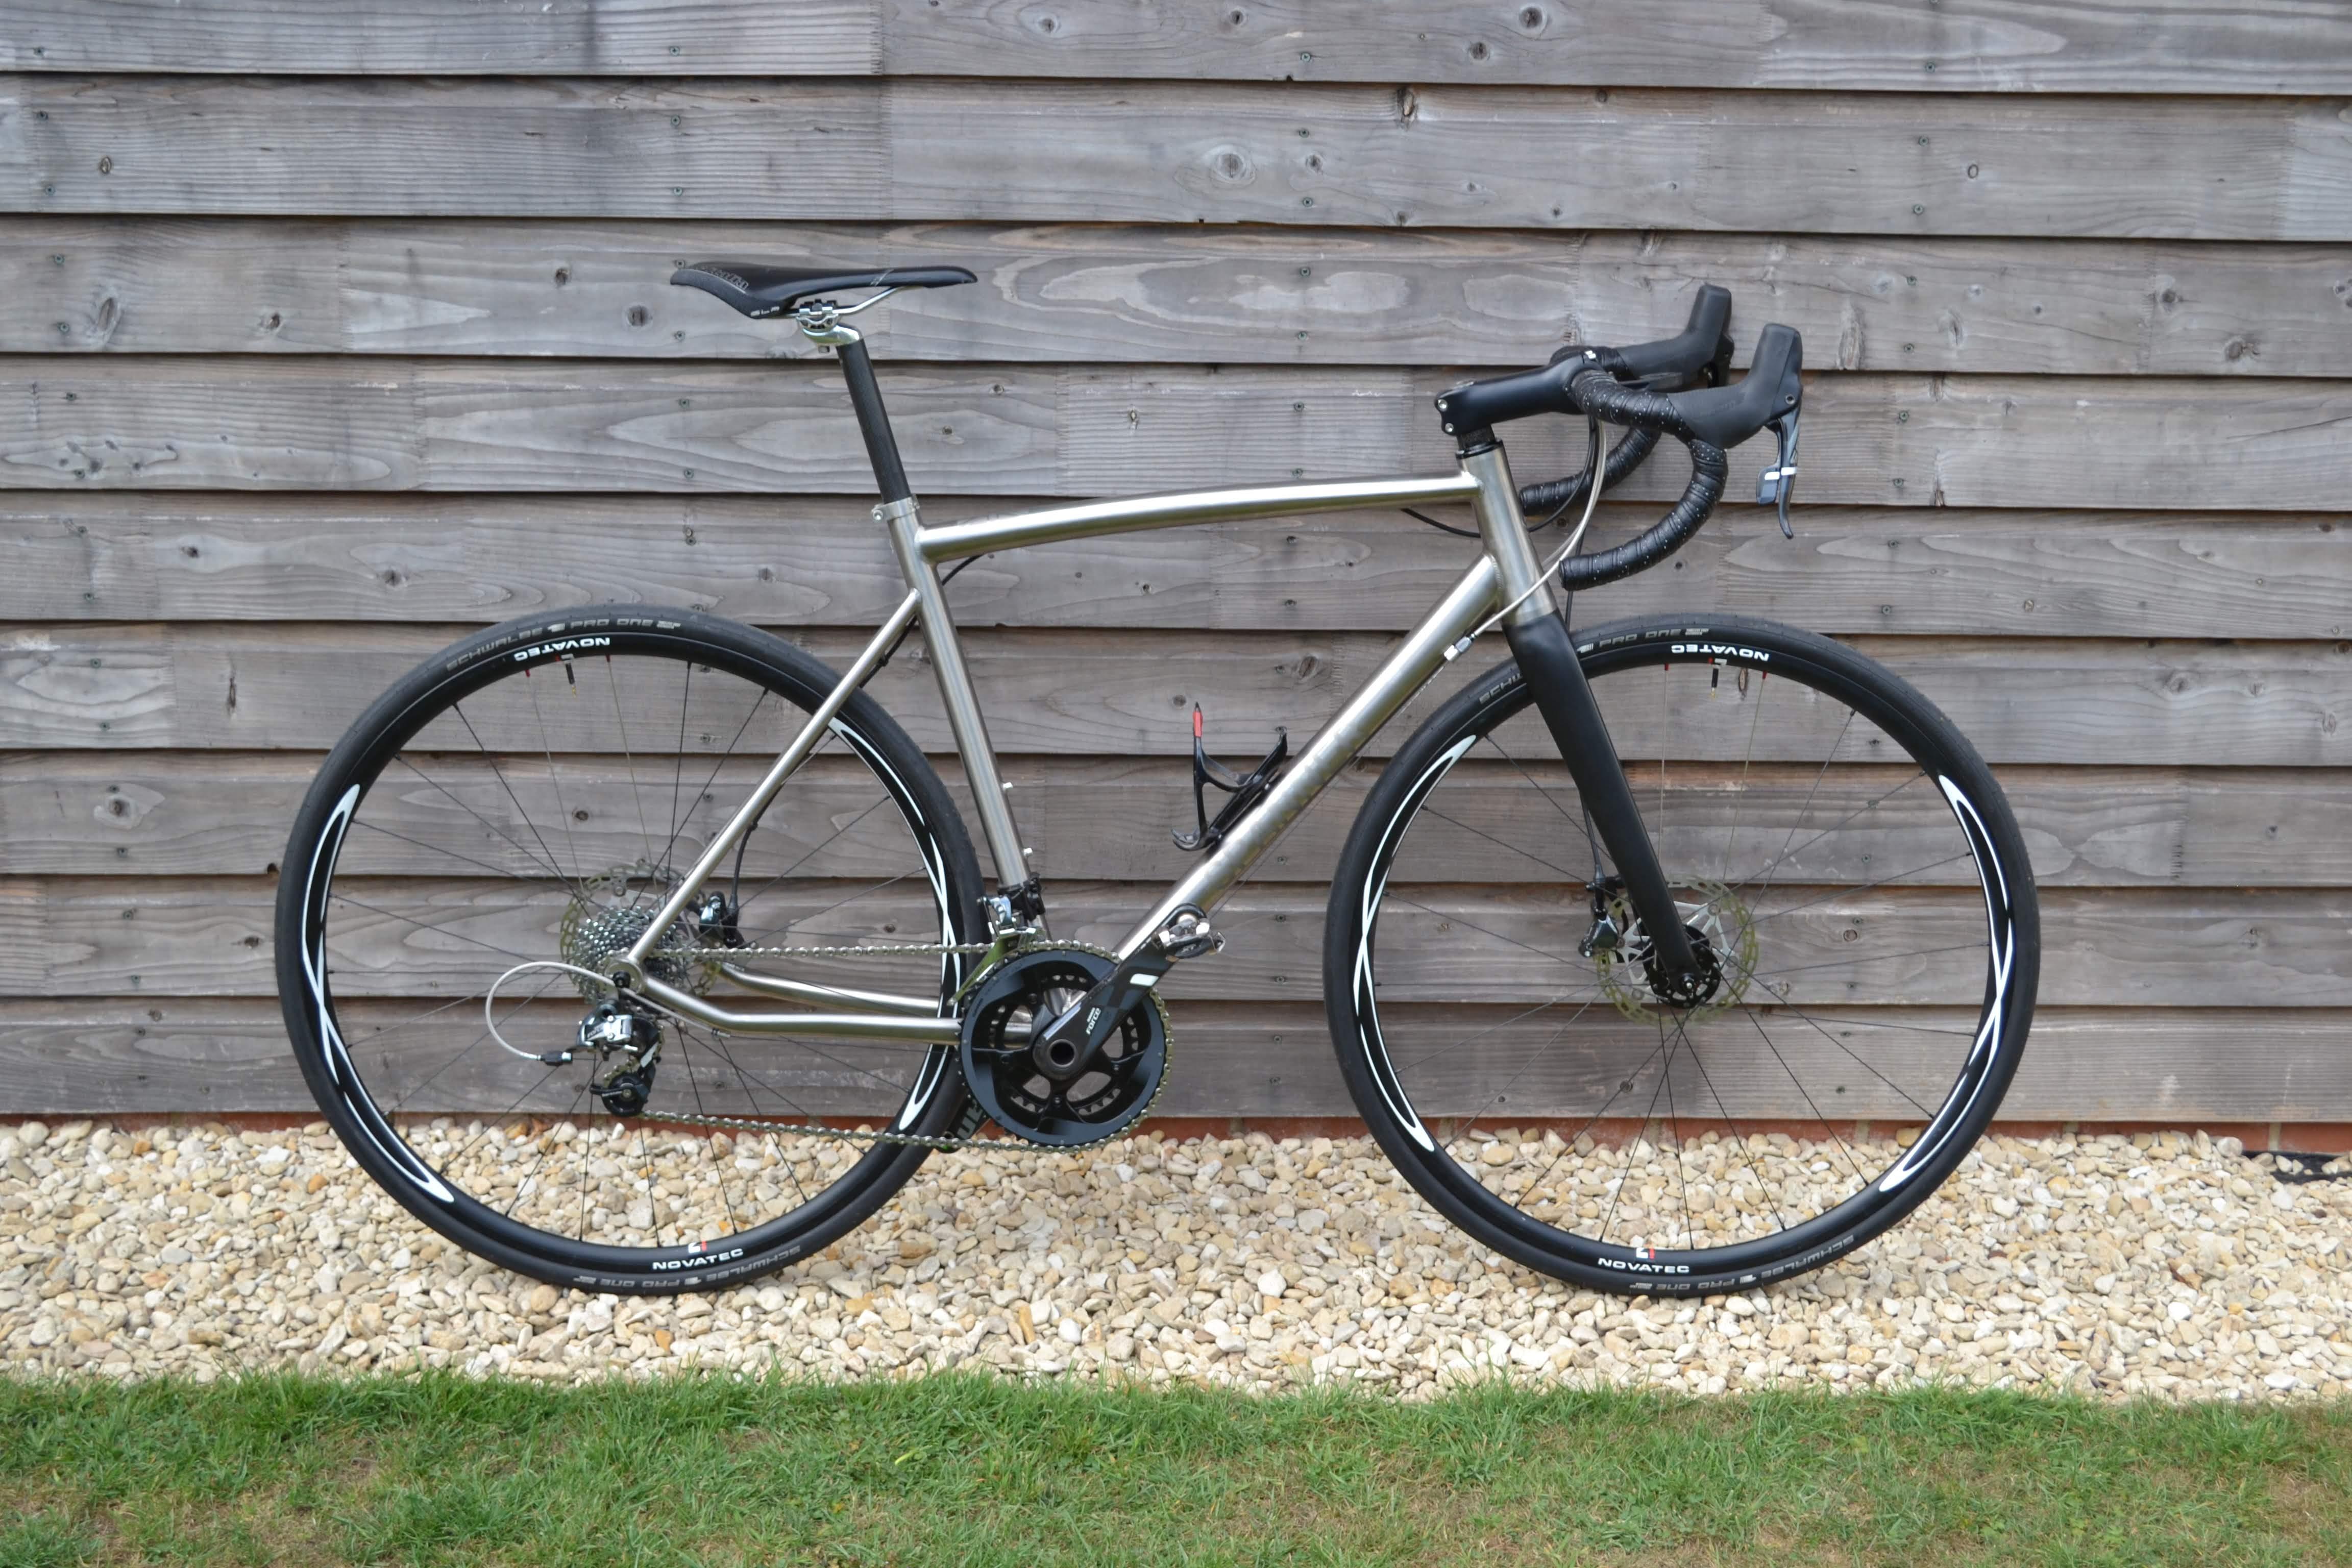 Tim's Lightweight Titanium Disk Road Bike